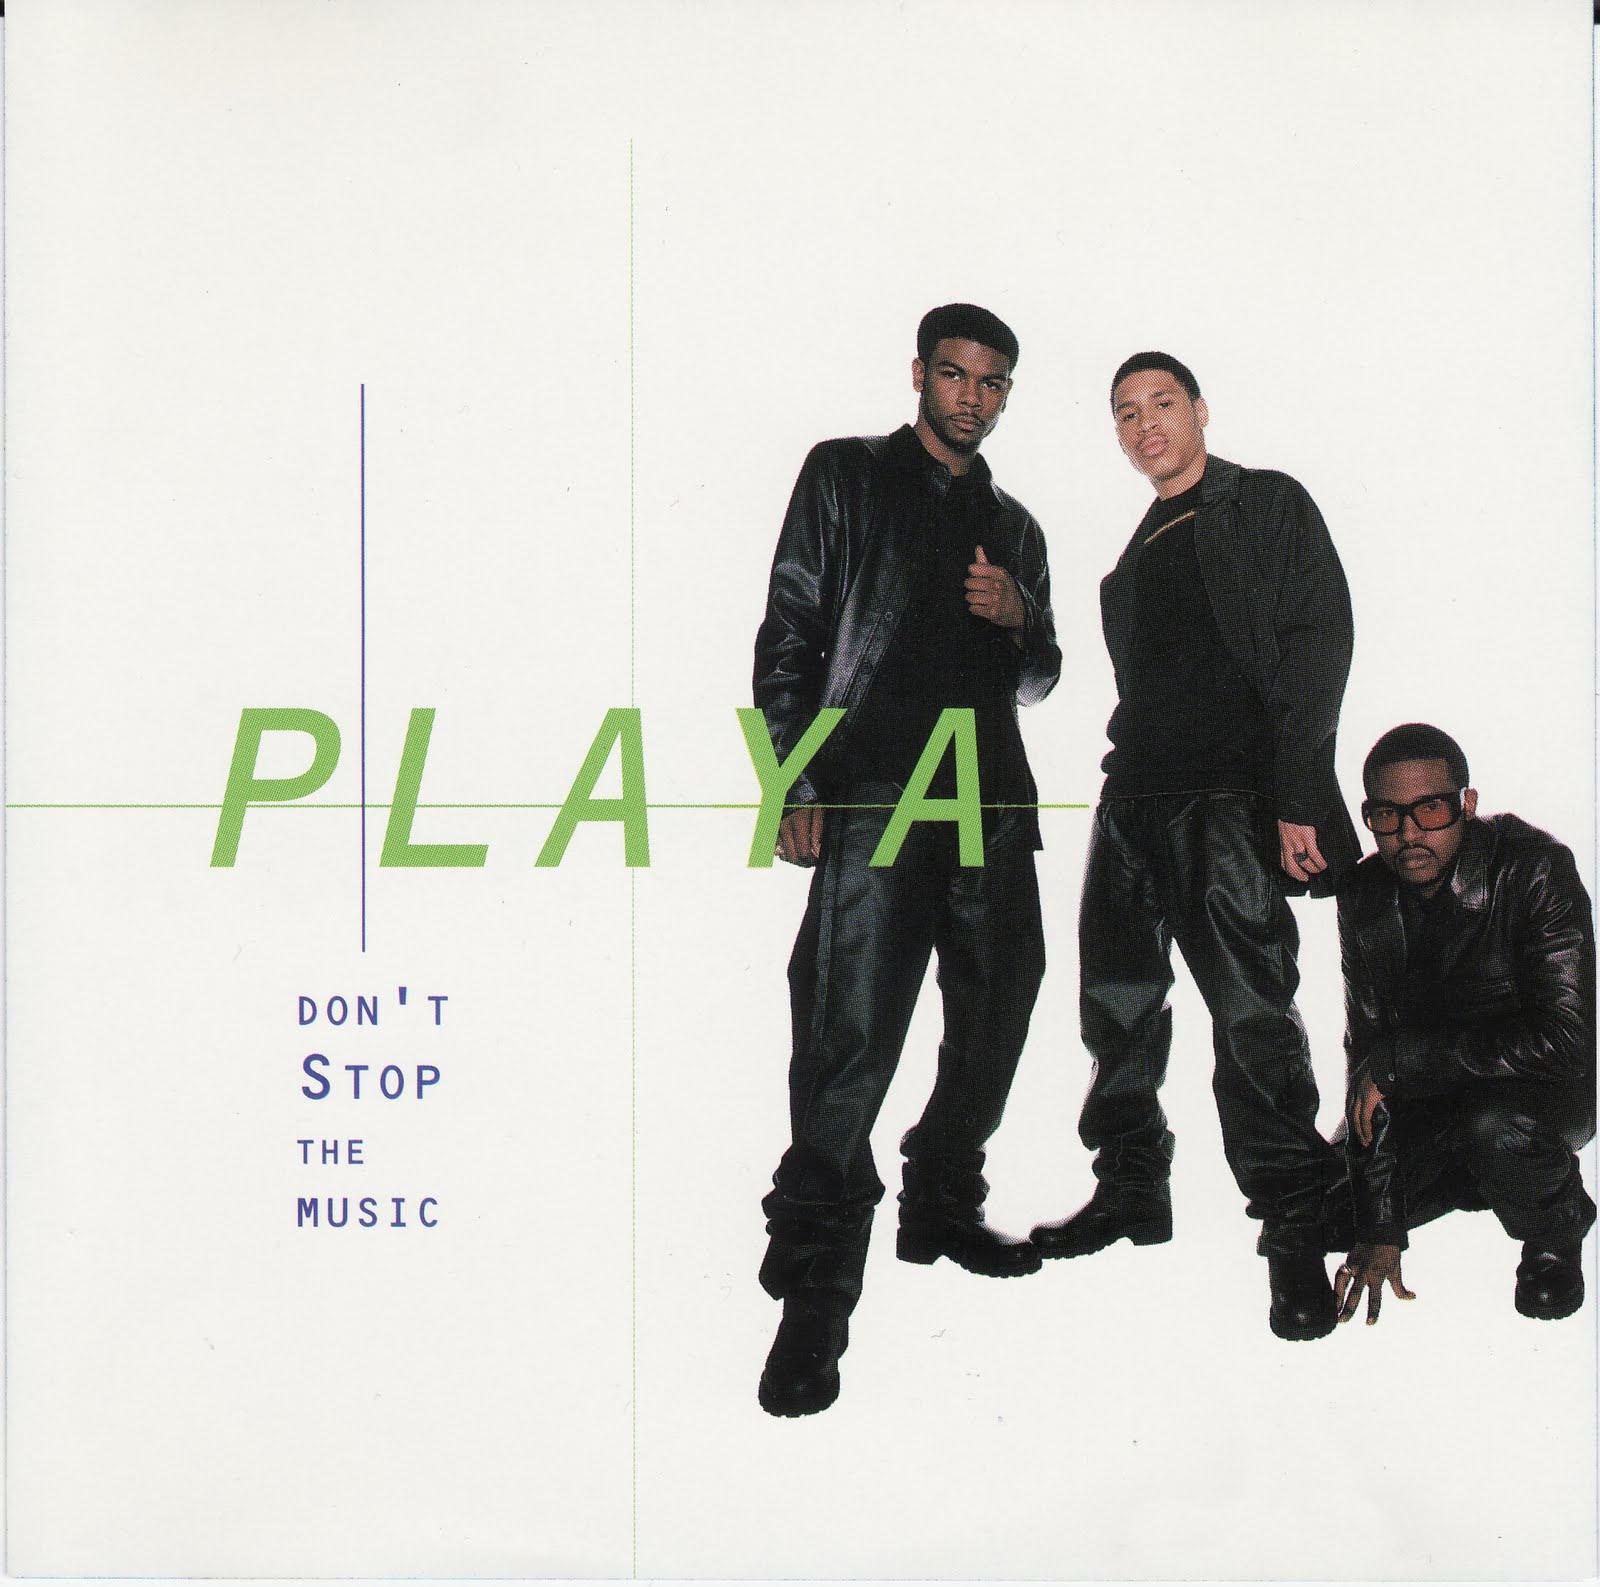 http://3.bp.blogspot.com/_xT-jSr7LNFM/S7Sgu2bJesI/AAAAAAAAAFA/k-s5Pb6APOw/s1600/Playa+-+00+-+Don%27t+Stop+The+Music+(CDS-1997)-Front.jpg